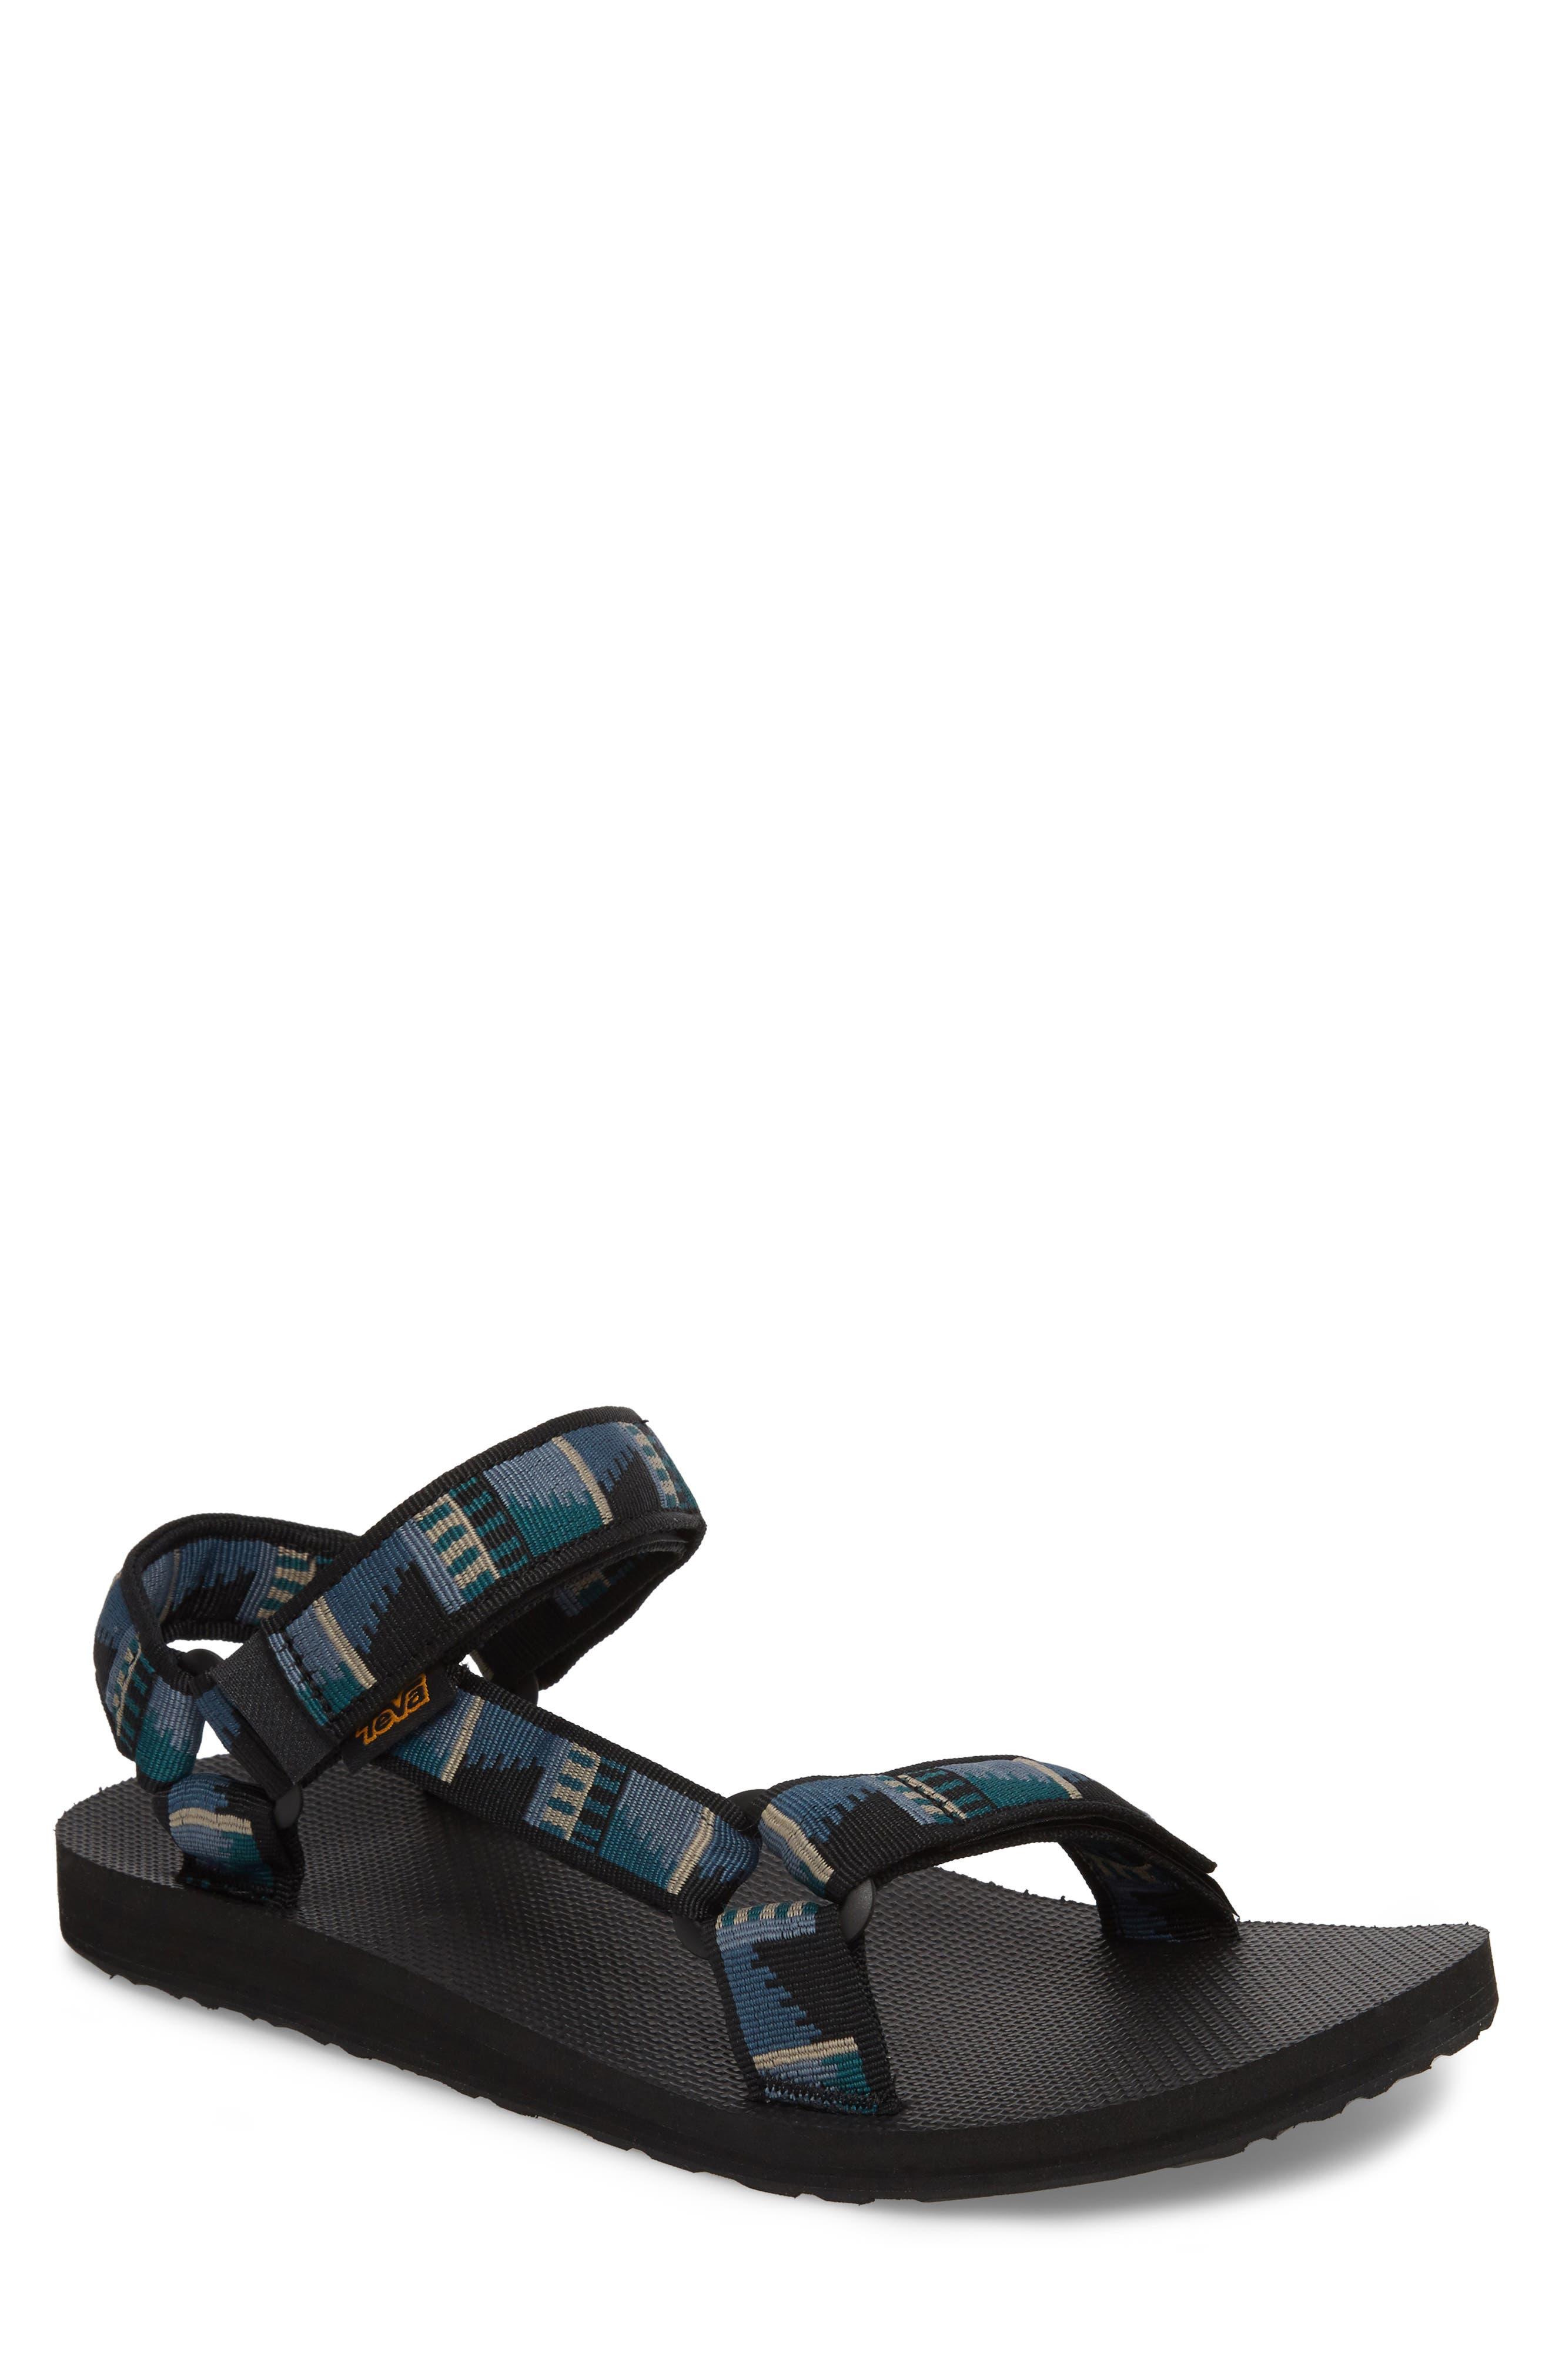 Original Universal Sandal,                         Main,                         color, BLACK NYLON